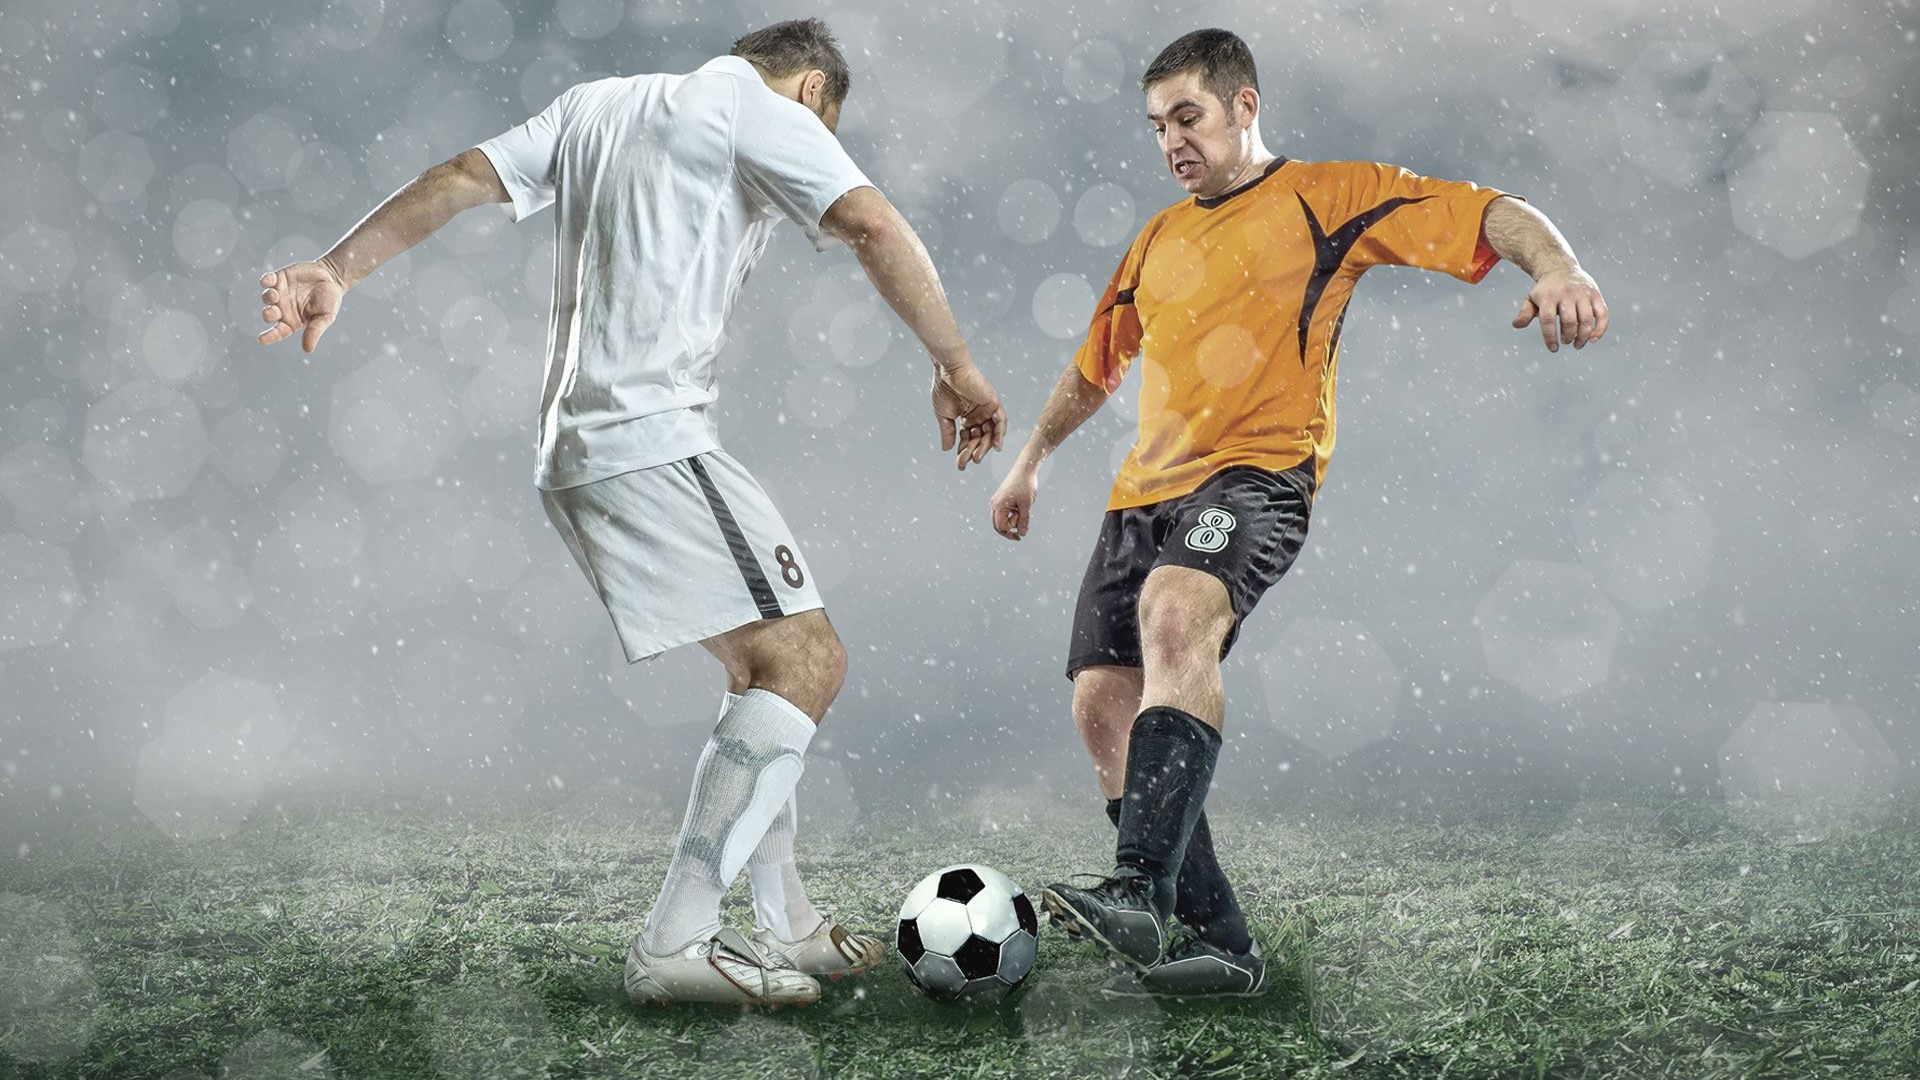 watch-edinburgh-vs-munster-rugby-live